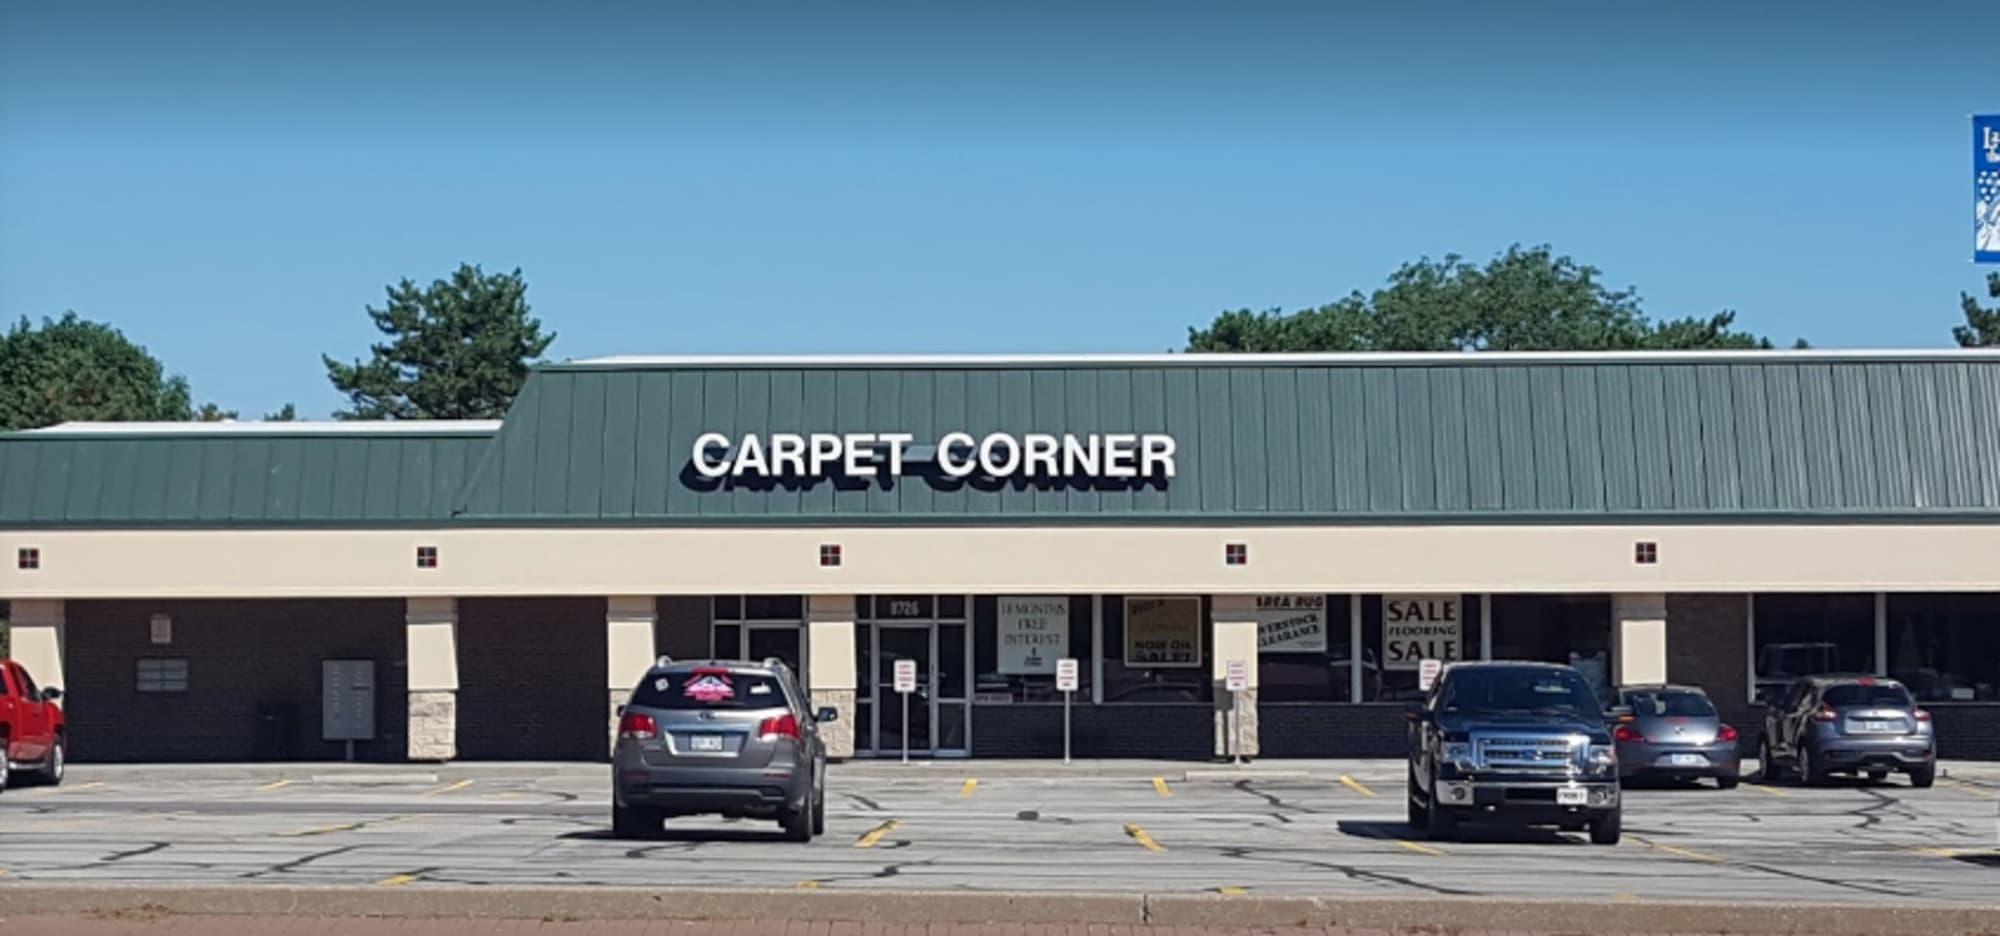 Carpet Corner - 8726 Santa Fe Dr Overland Park, KS 66212